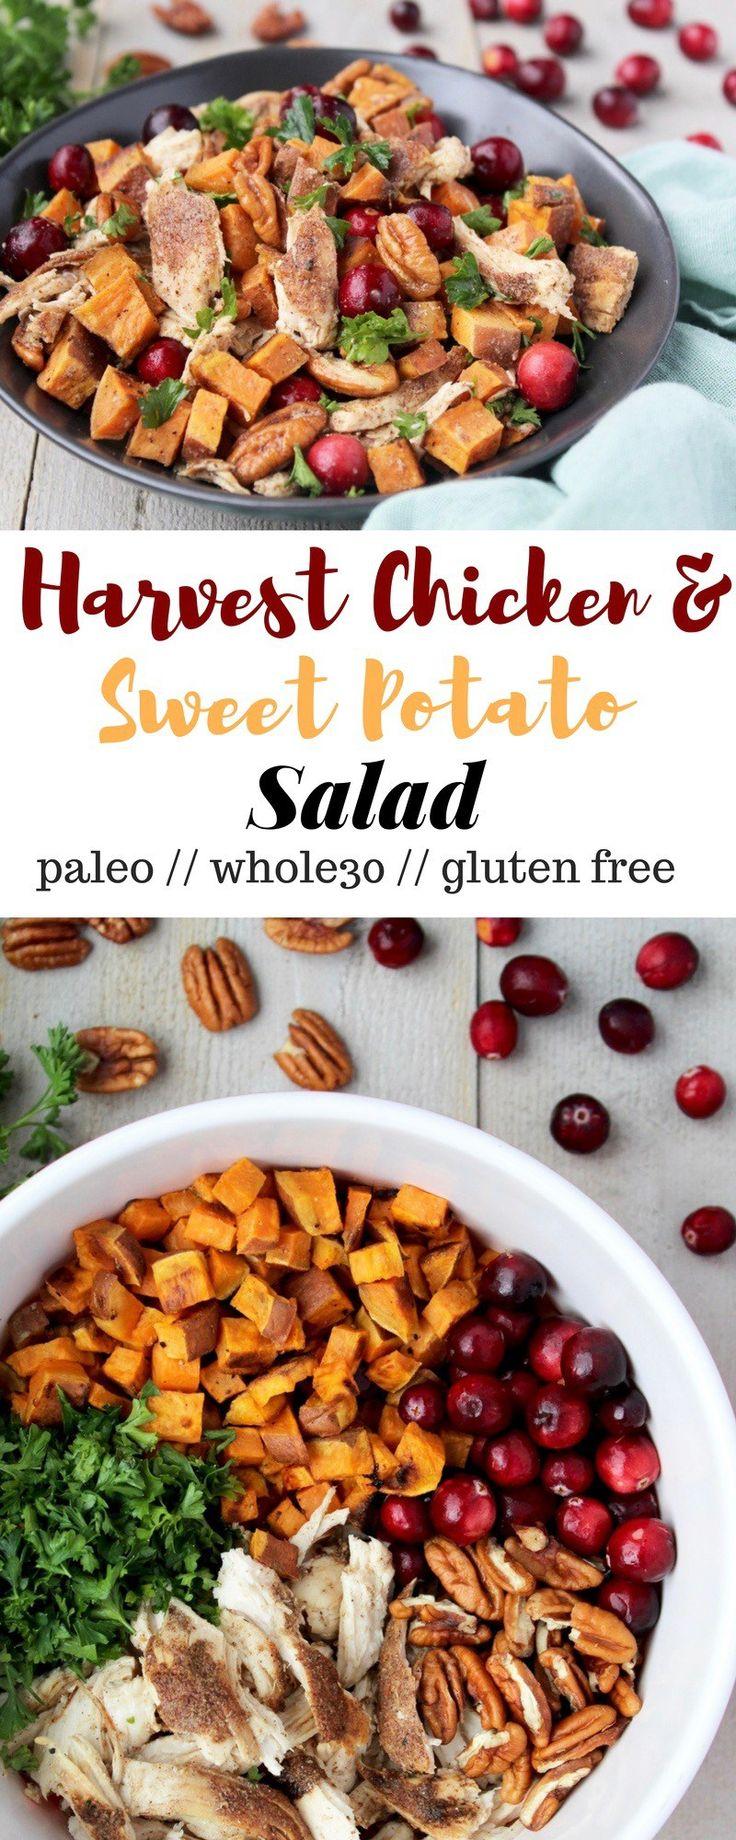 Harvest Chicken & Sweet Potato Salad